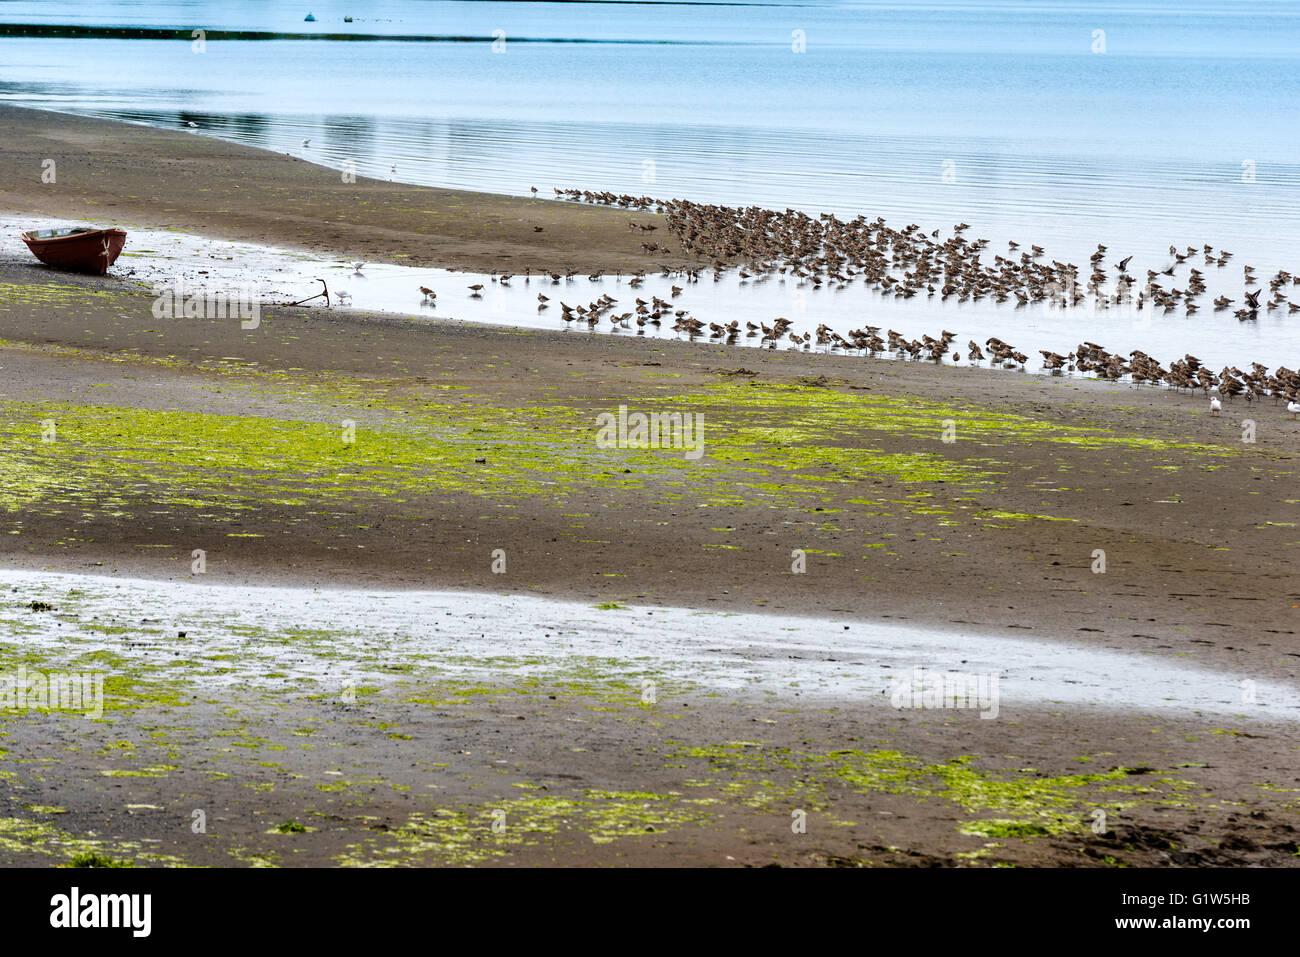 A colony of migratory beach birds in Curaco de Velez, Chiloe Island, Chile - Stock Image